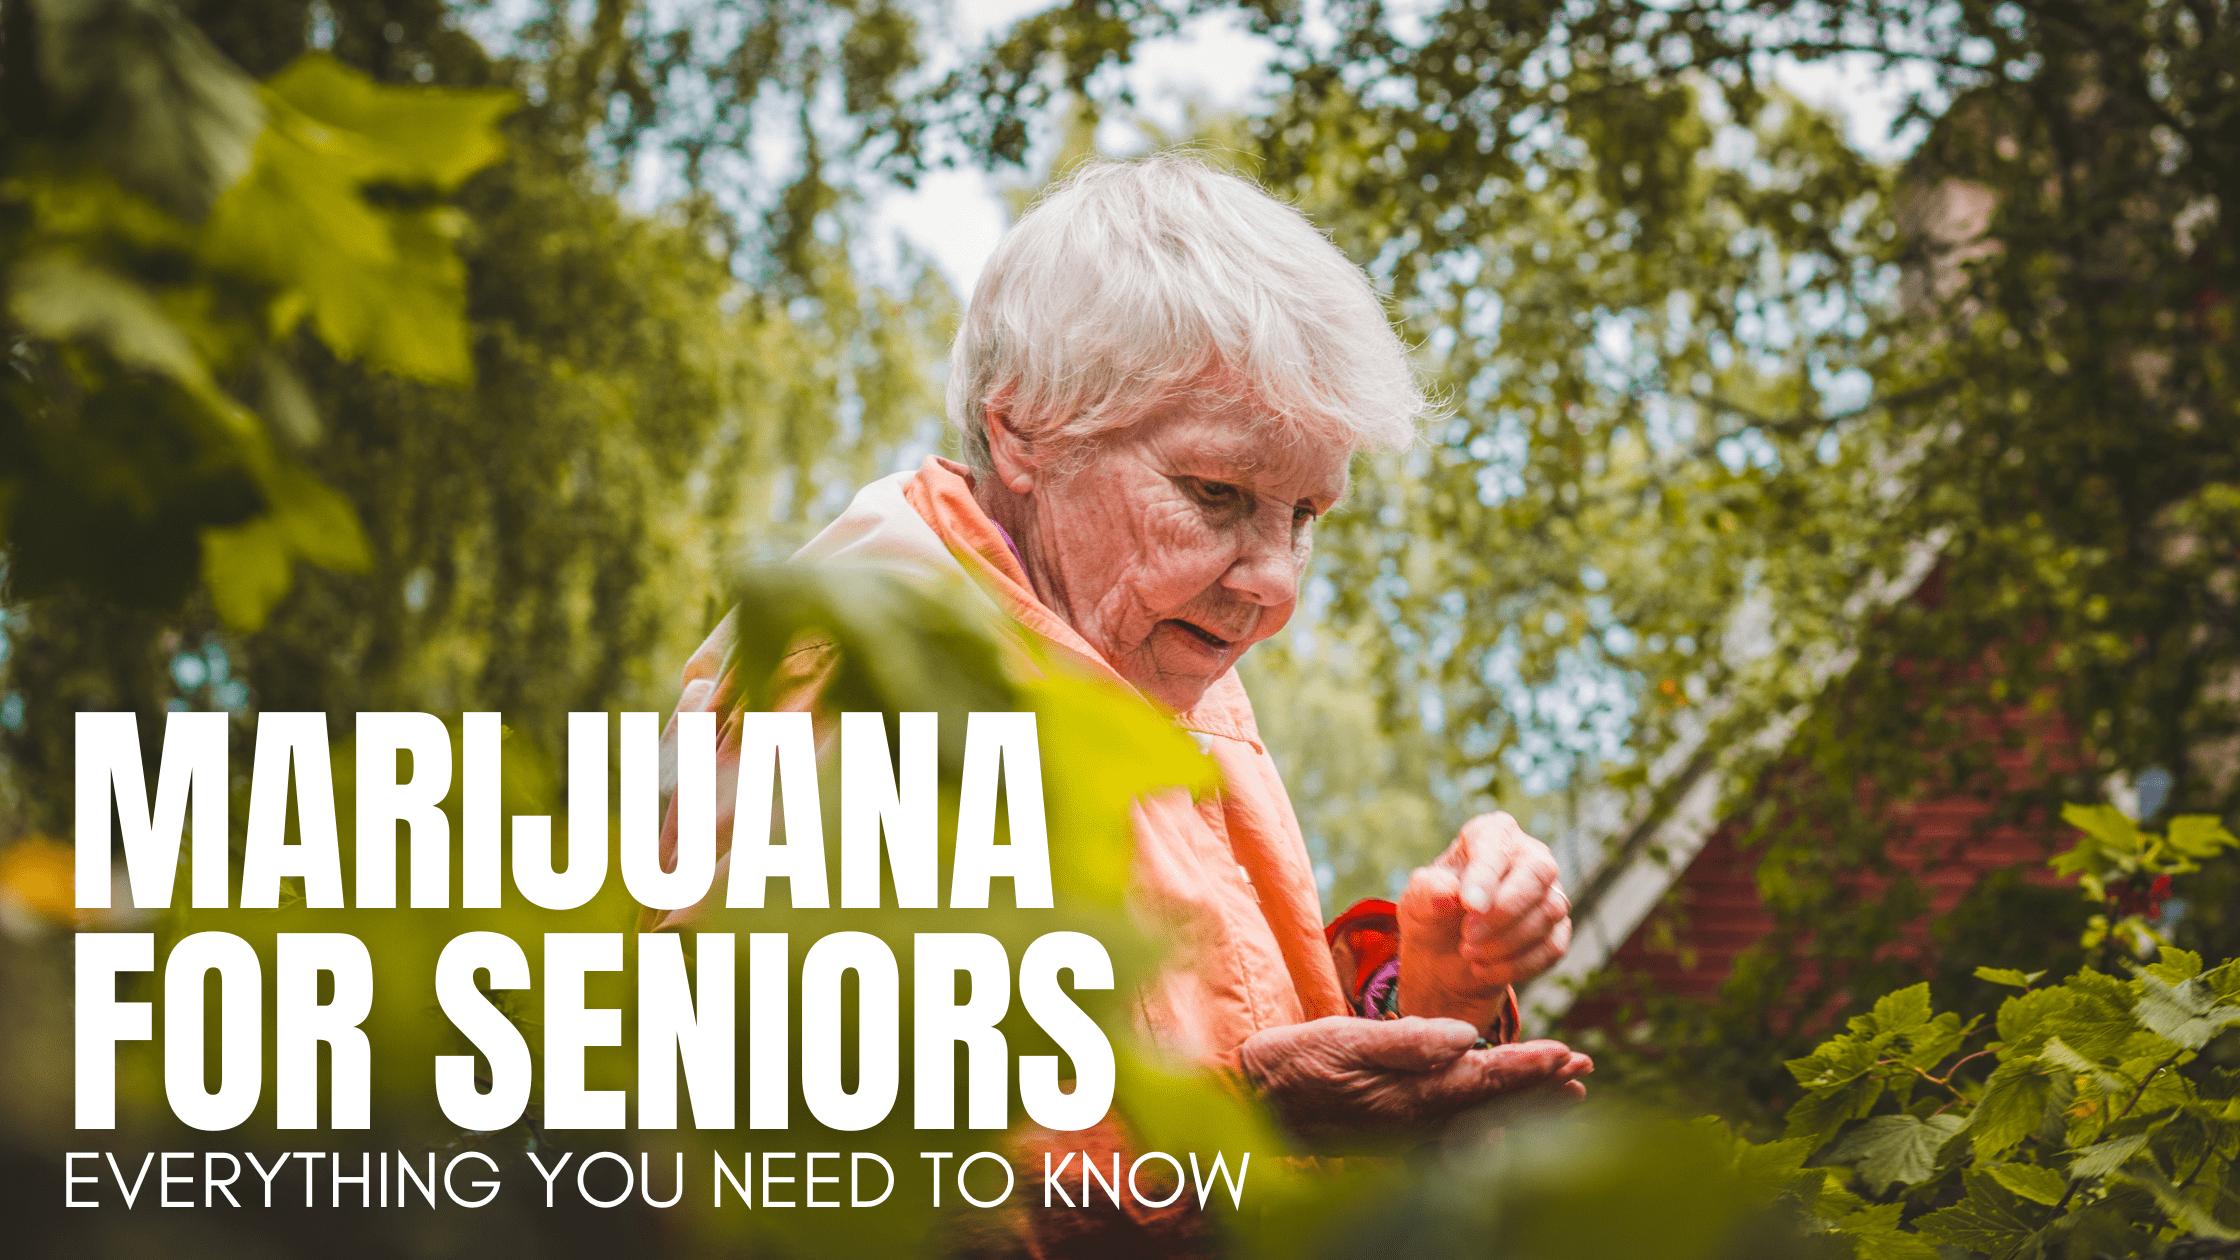 Medical Marijuana For Seniors - Everything You Need to Know